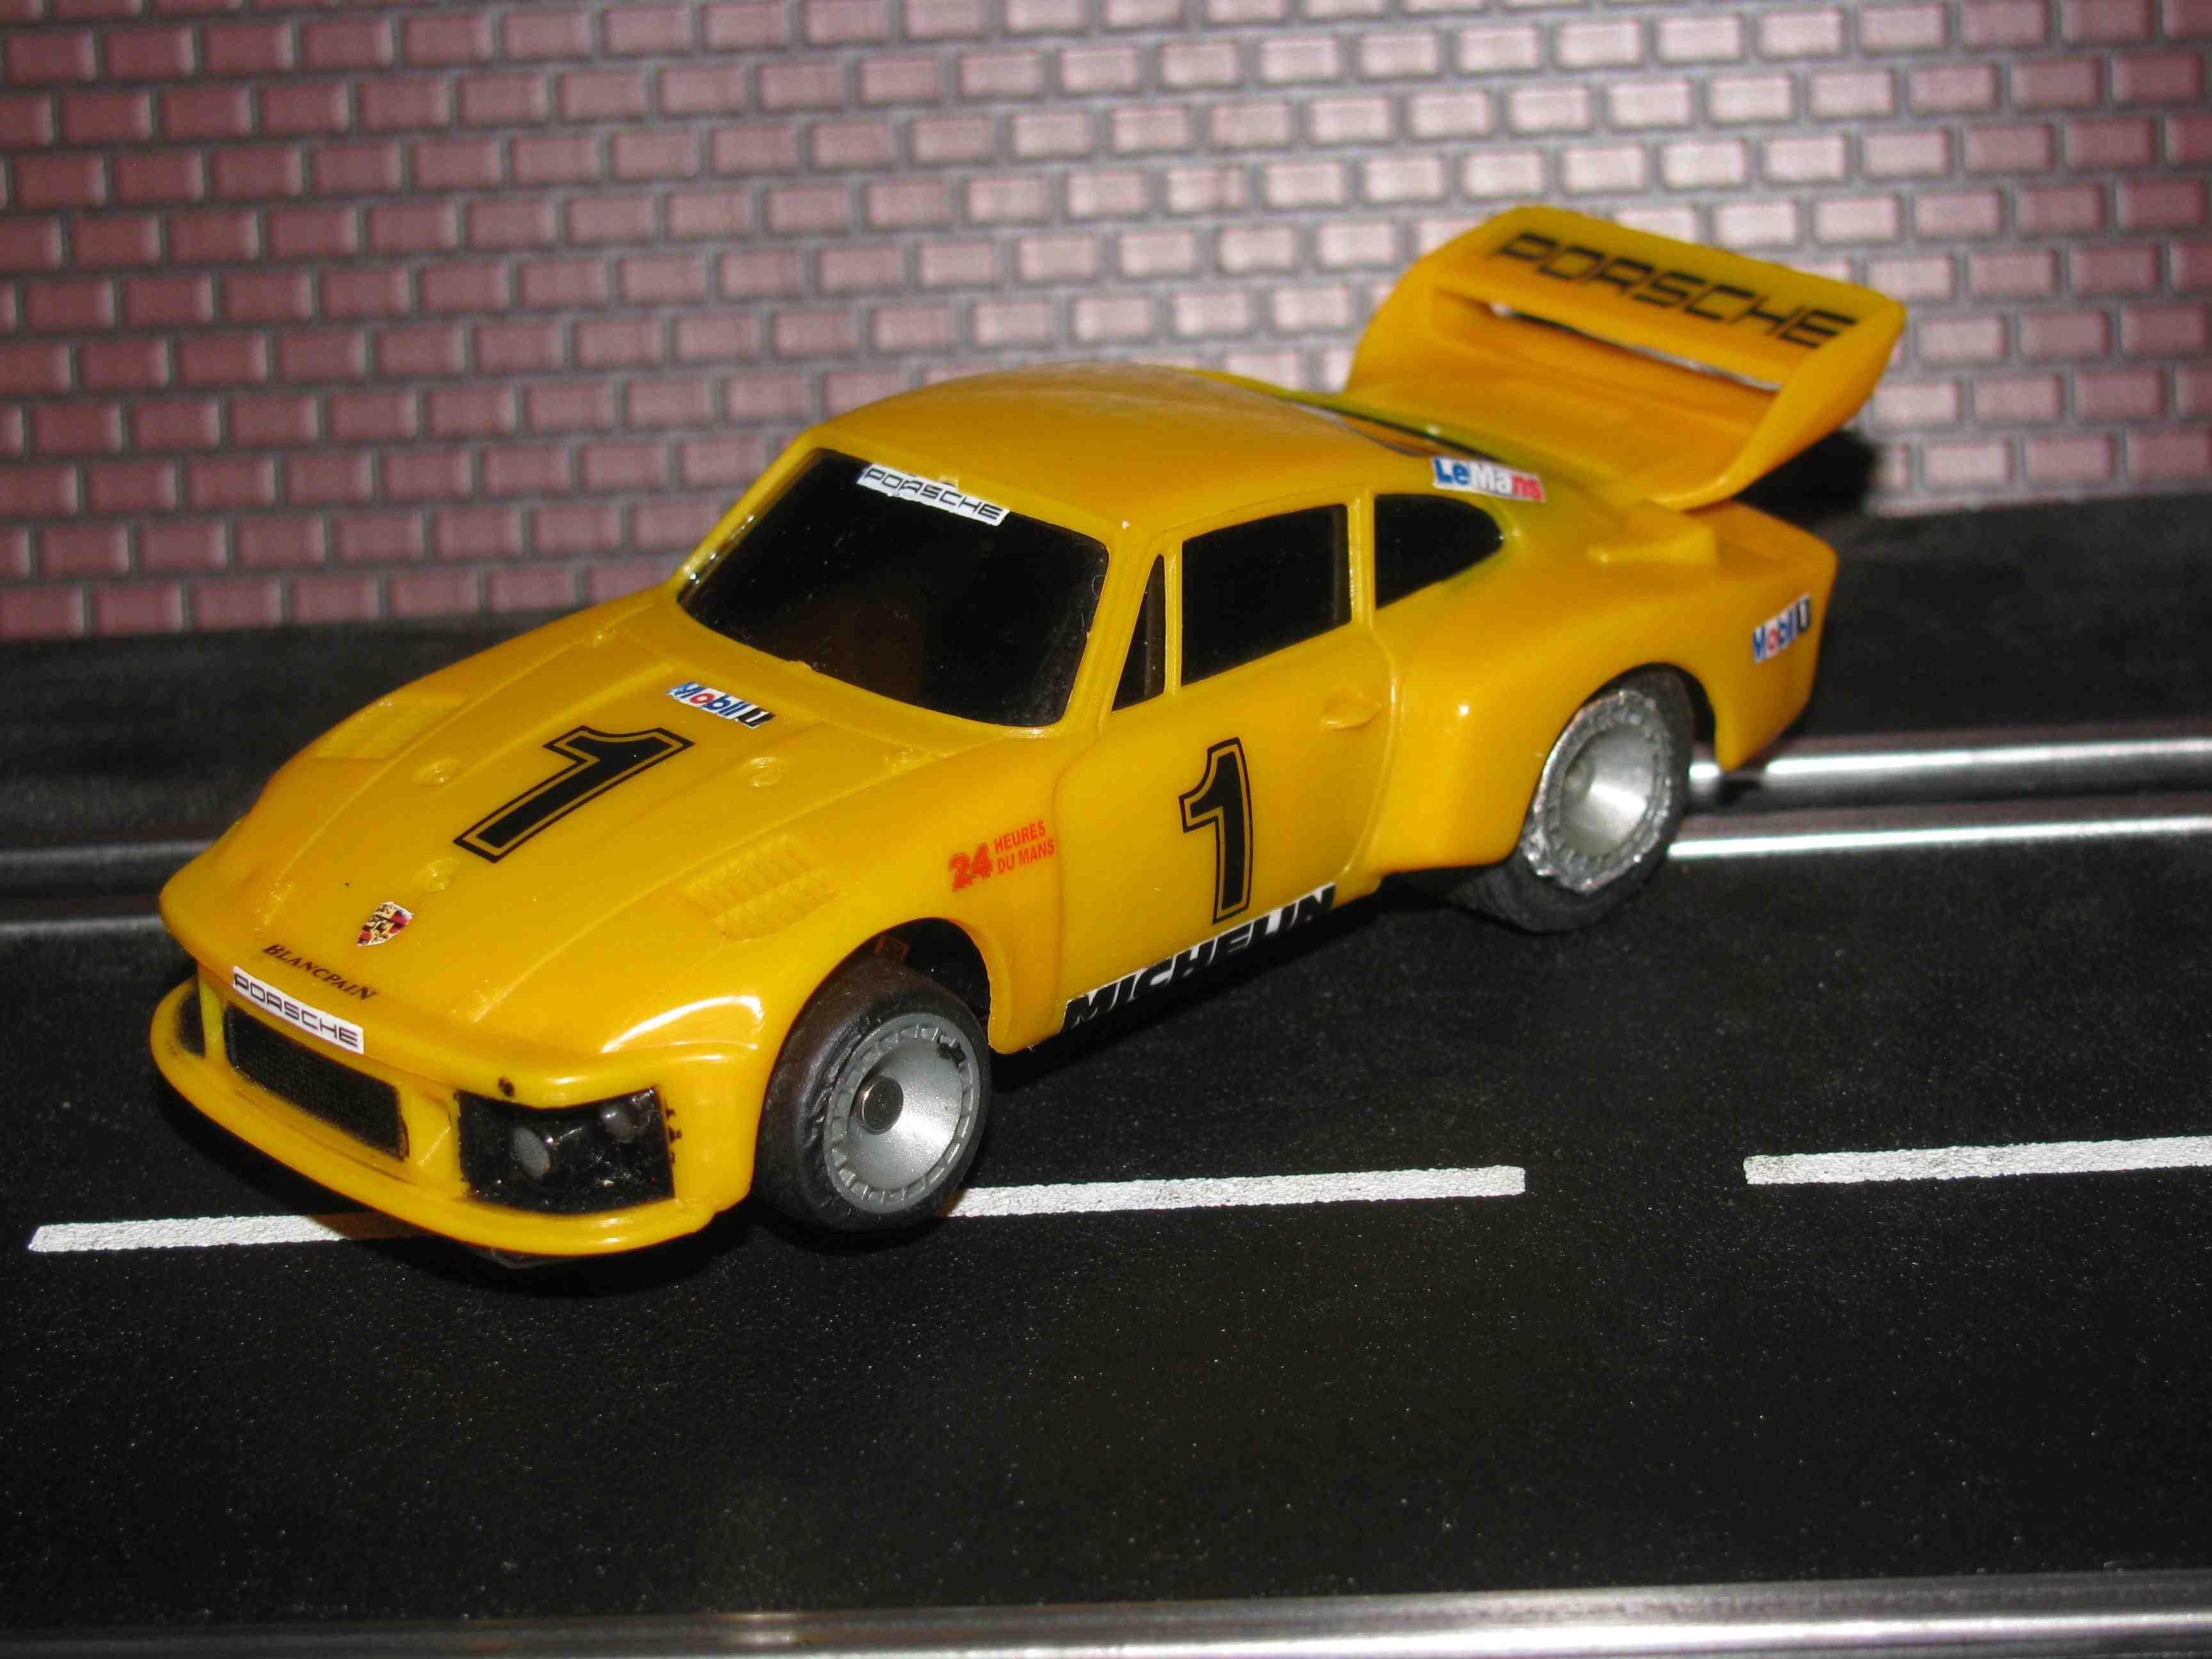 SuperTrax Bachmann Porsche 935 Slot Car 1/32 Scale Bachmann